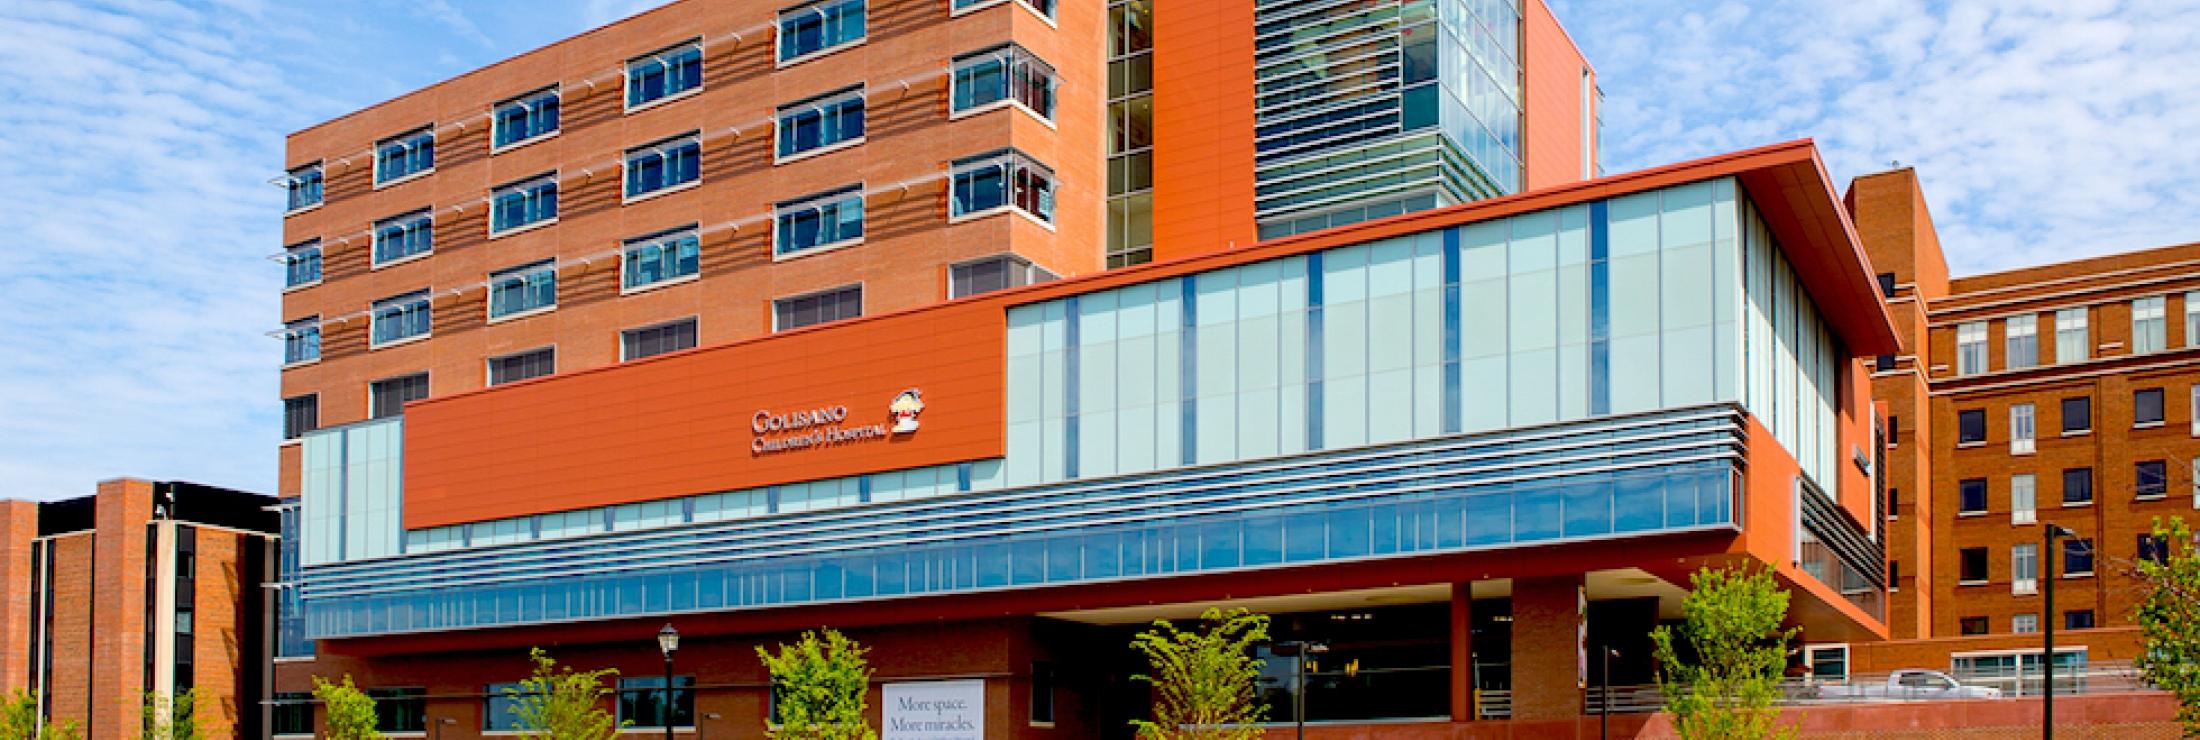 Cladding Corp Swisspearl Rainscreen Golisano Children's Hospital